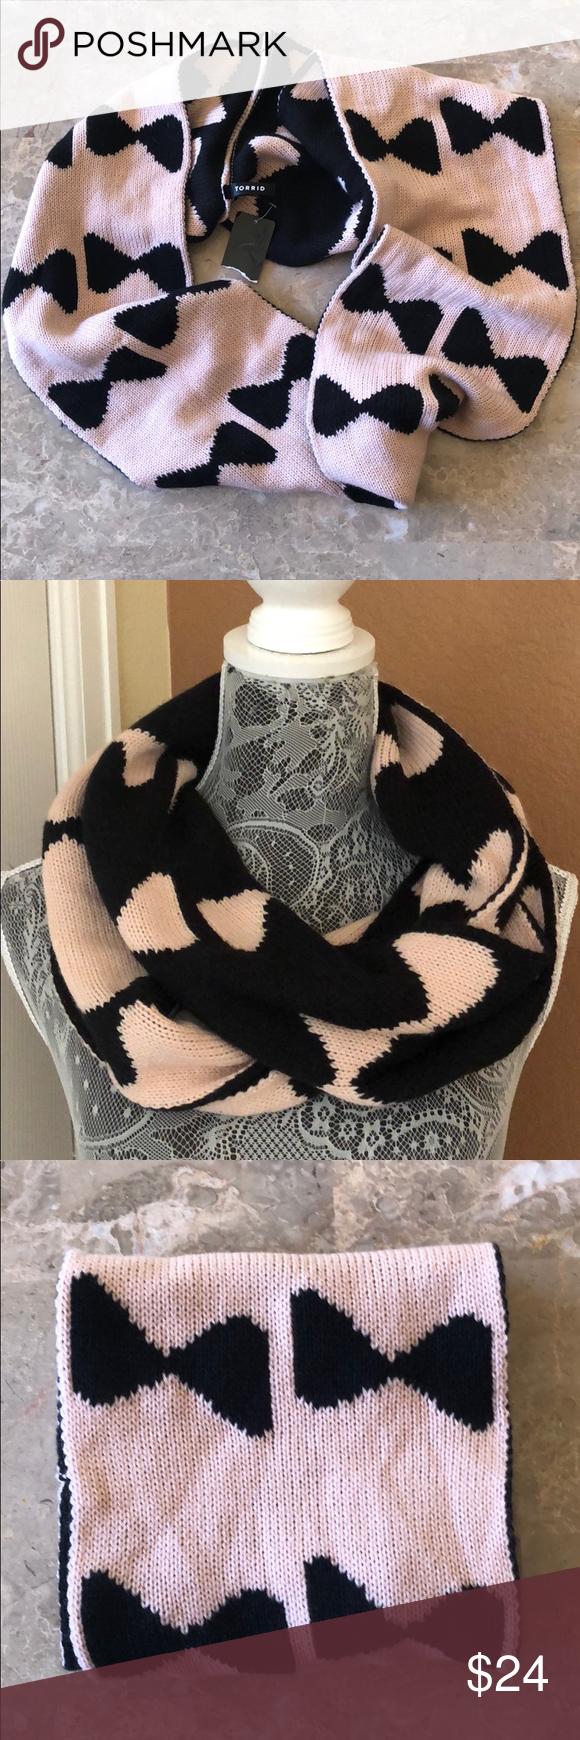 Photo of NWT Torrid Bow Tie Print Knit Infinity Scarf NWT torrid bow tie print knit infin…